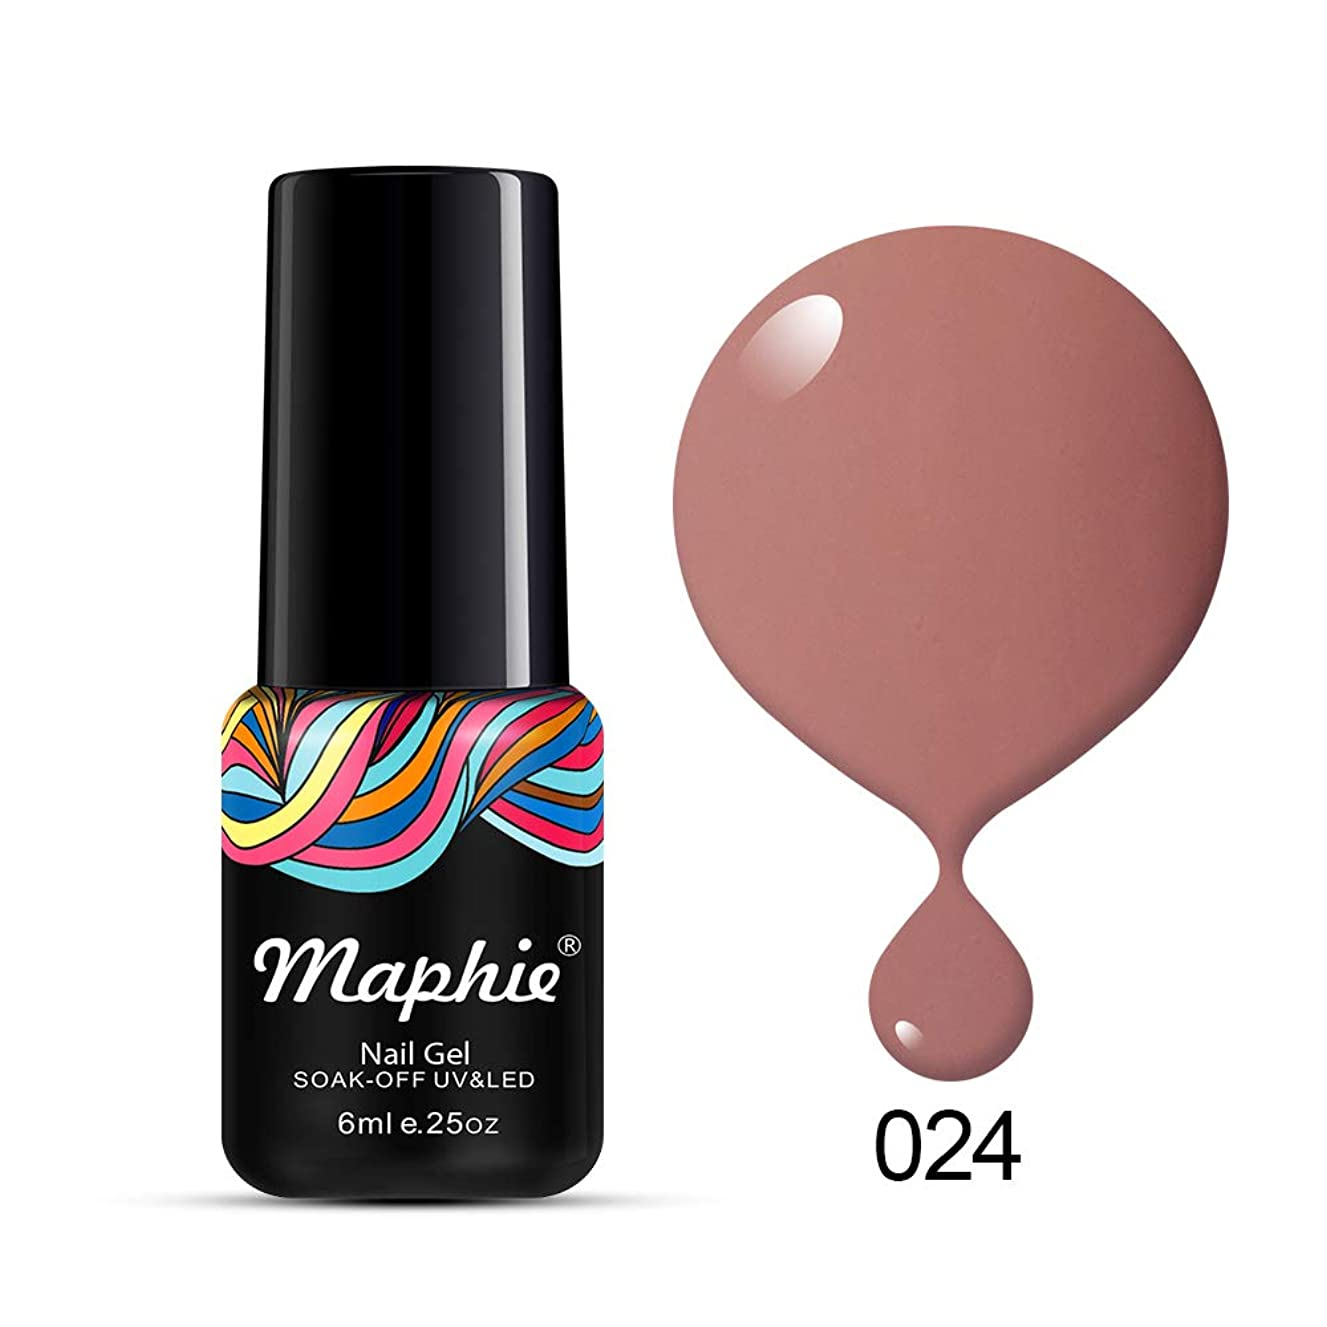 MAPHIE Soak Off UV LED Color Gel Nail Polish - Charming Nude 6ml